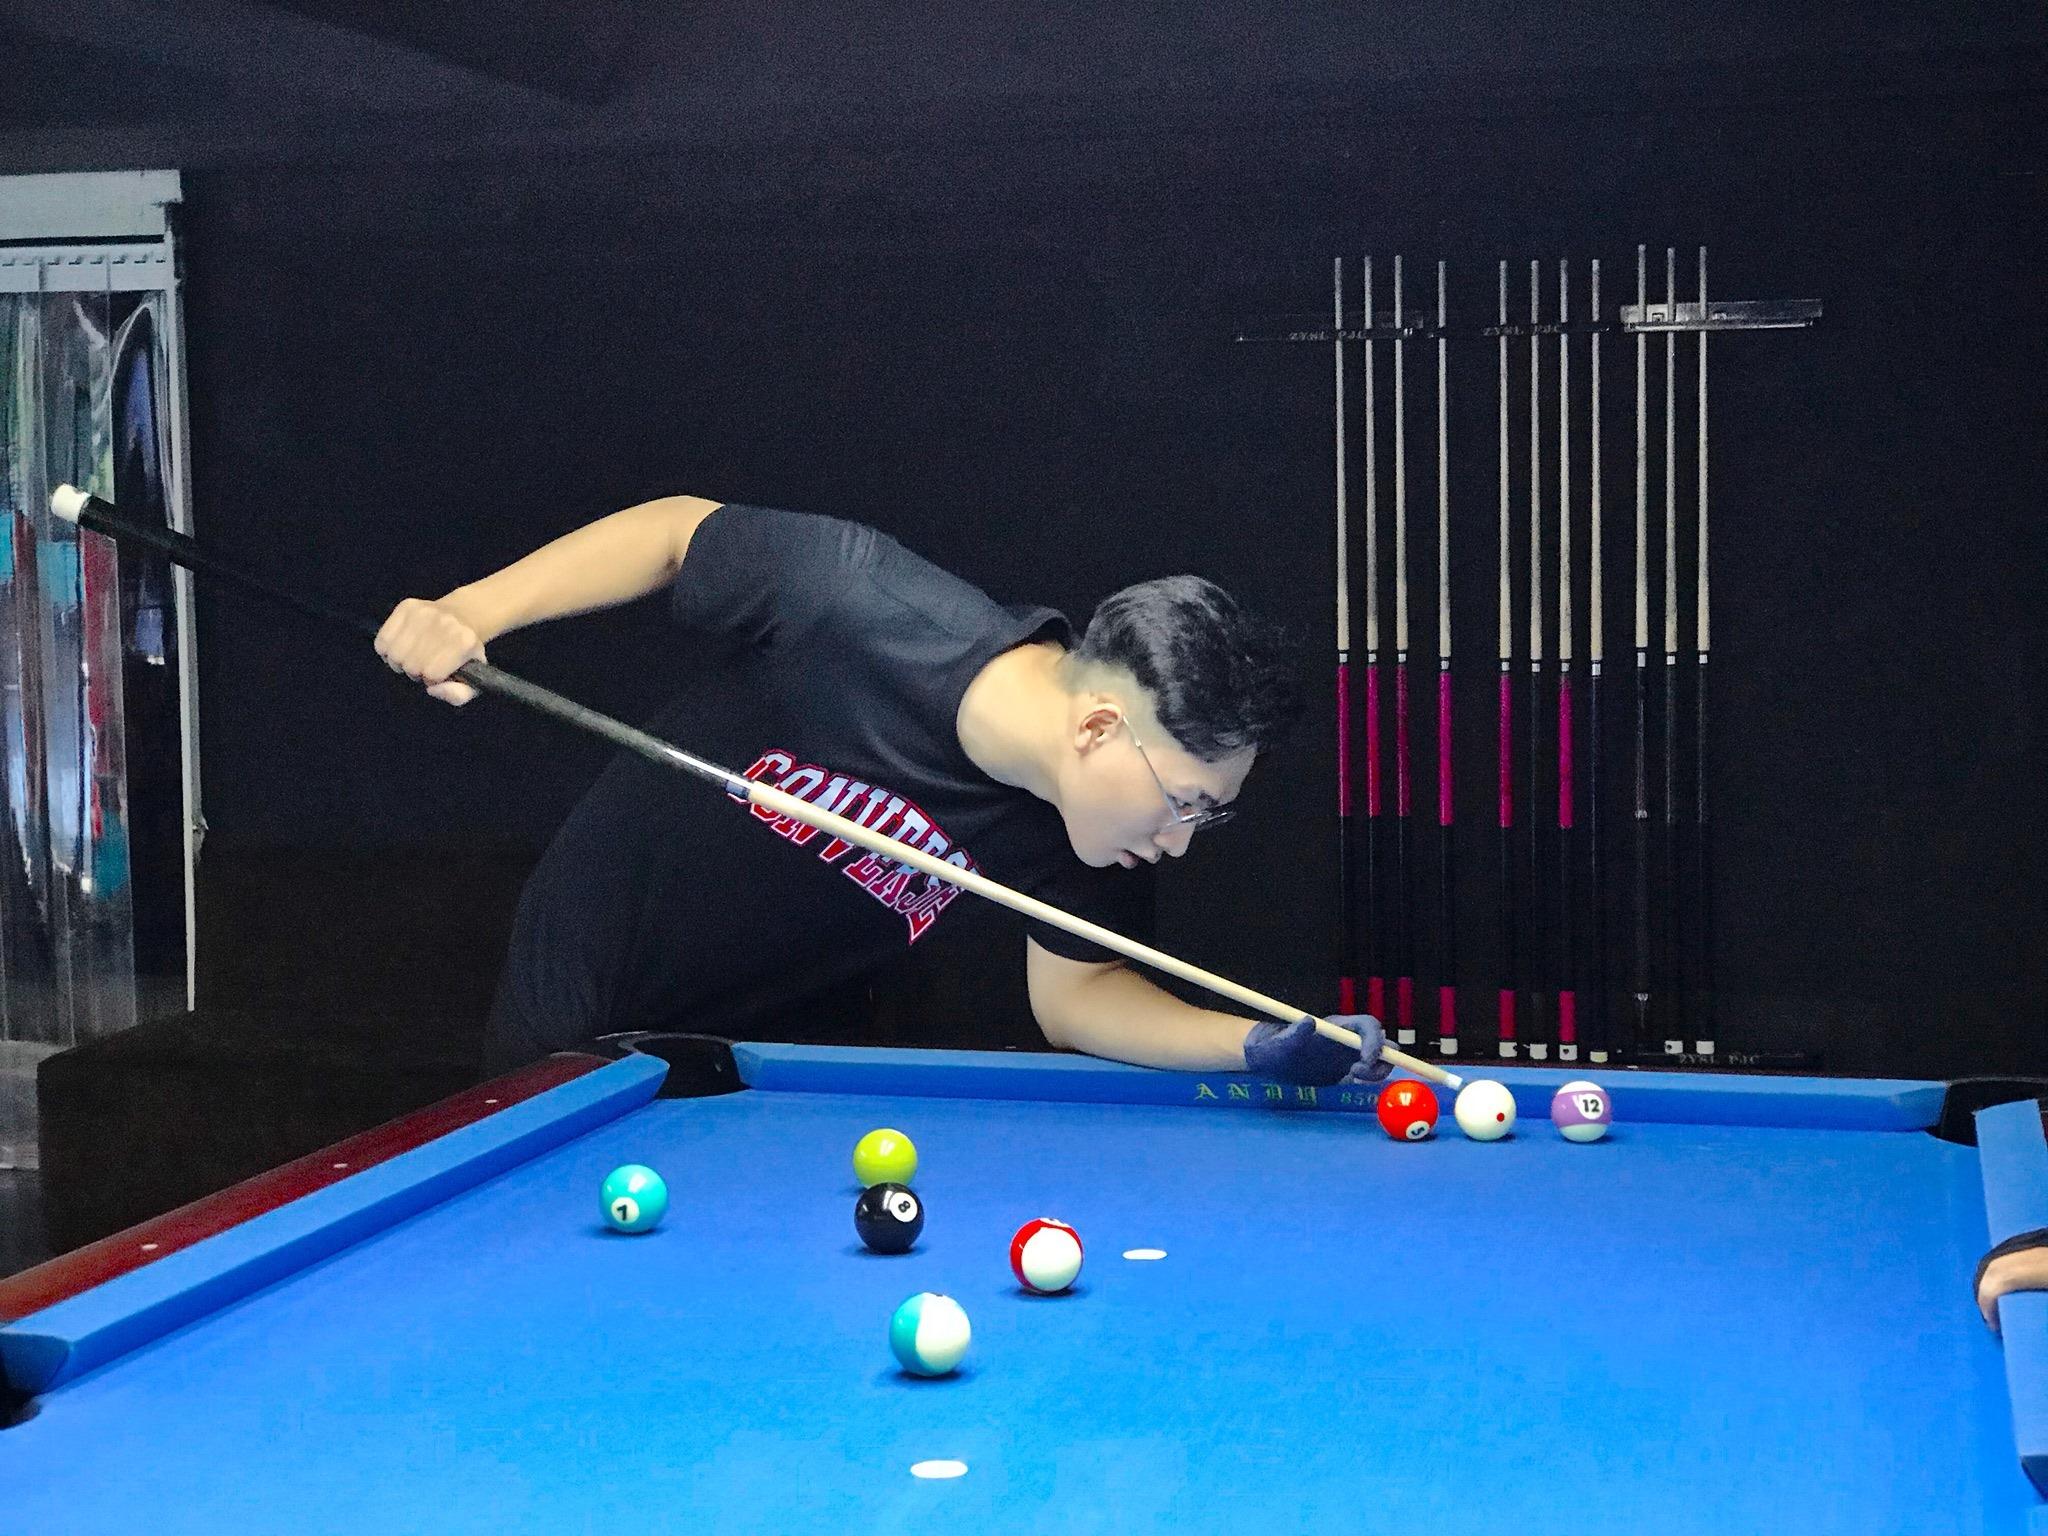 things to do in Hanoi - pool tournament